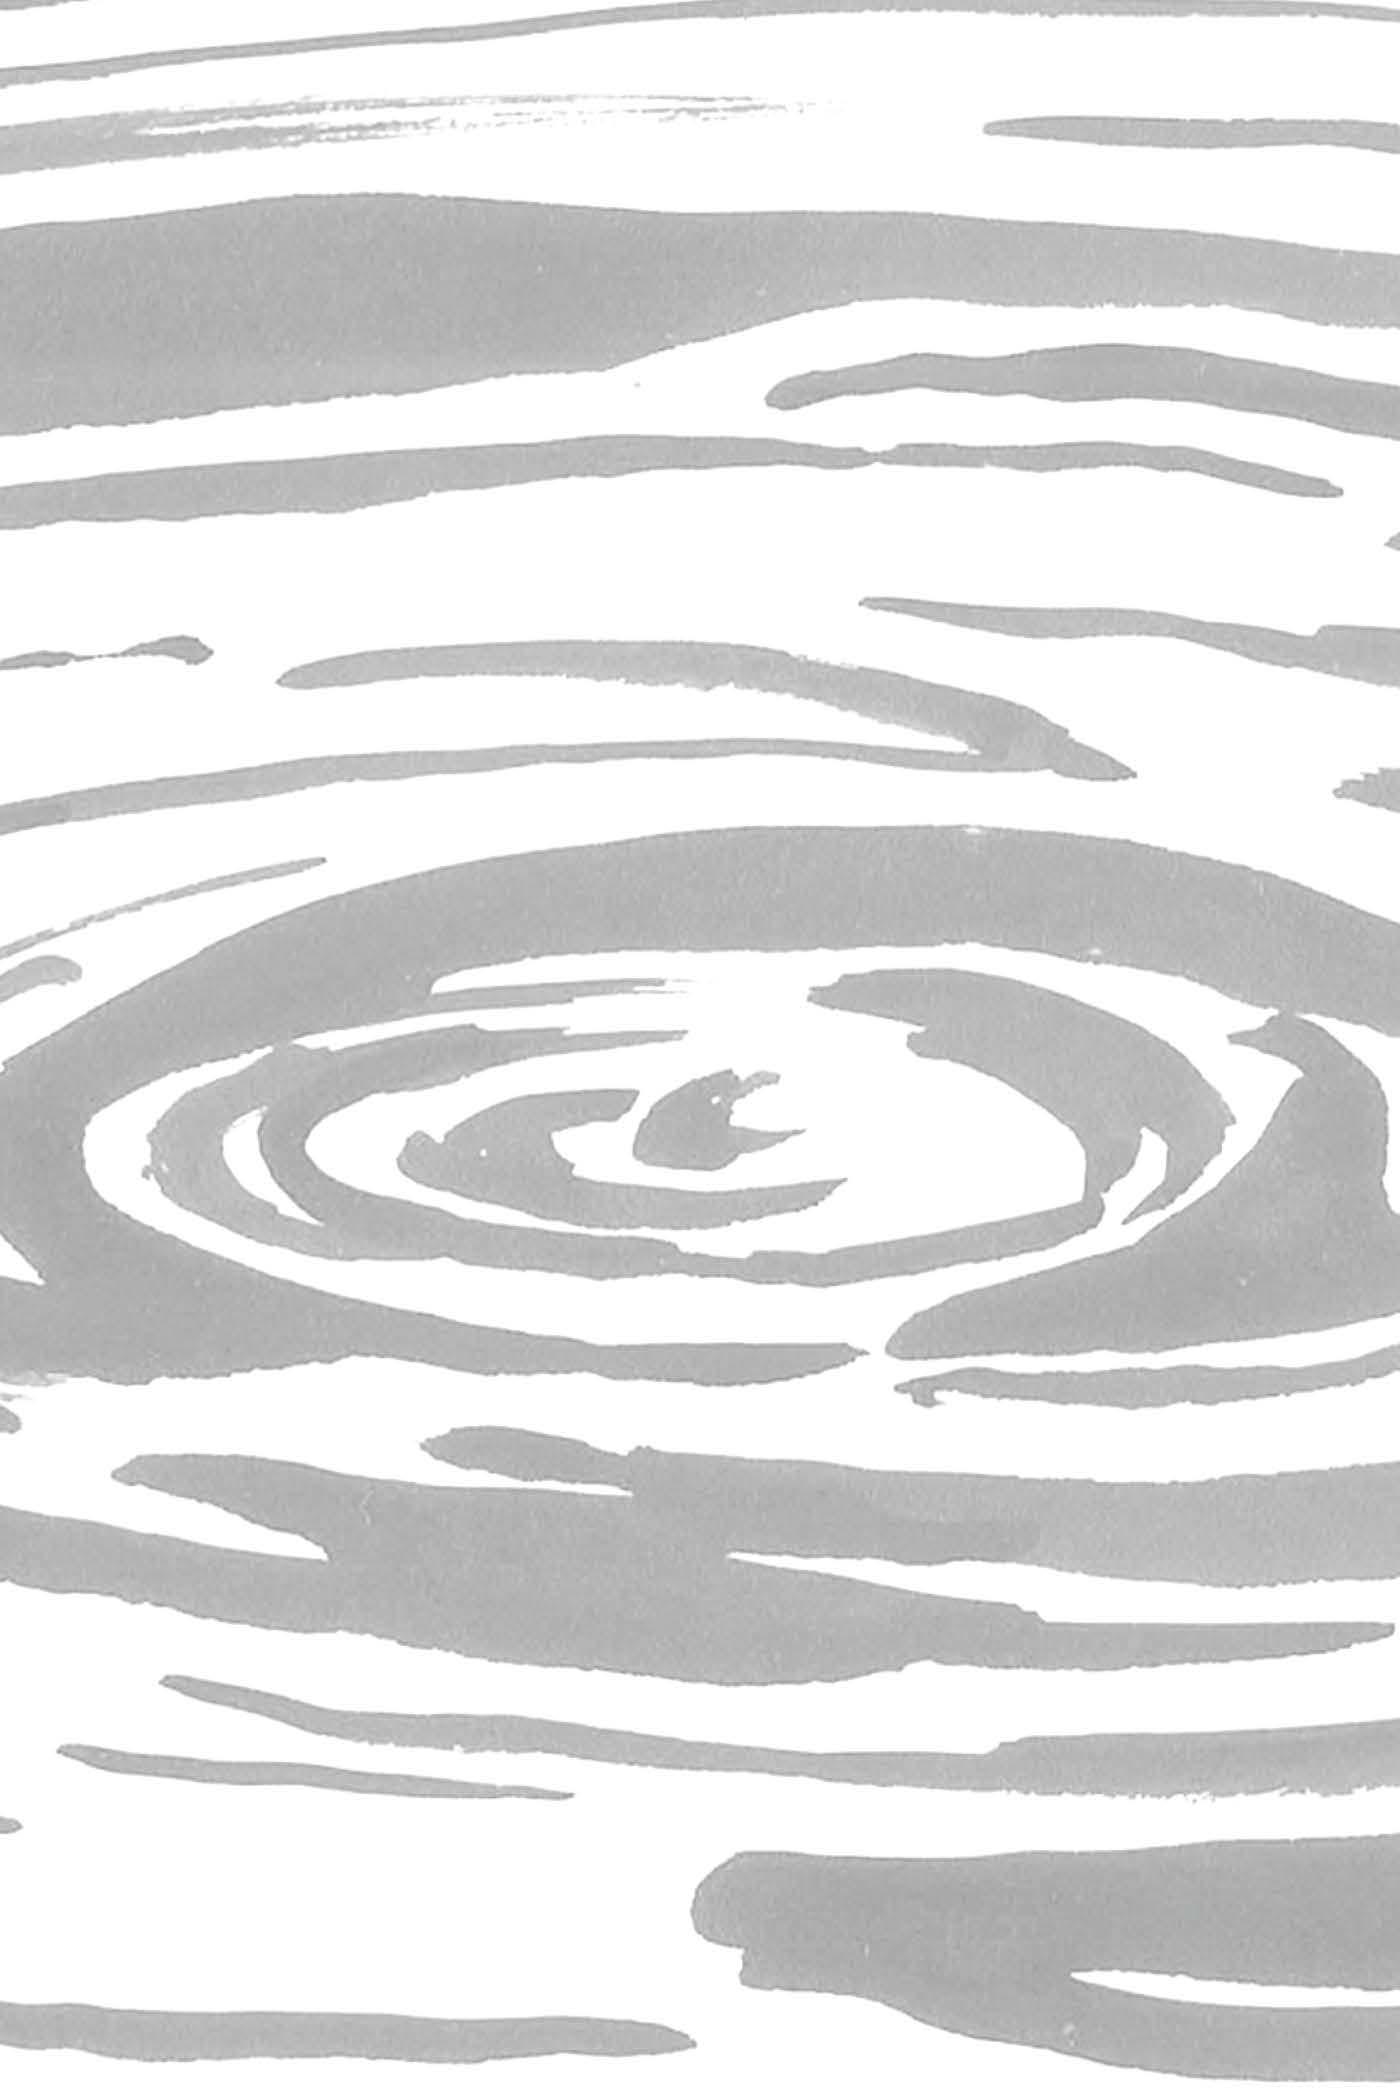 LAKE_IMAGO_2_lo_Page_04.jpg